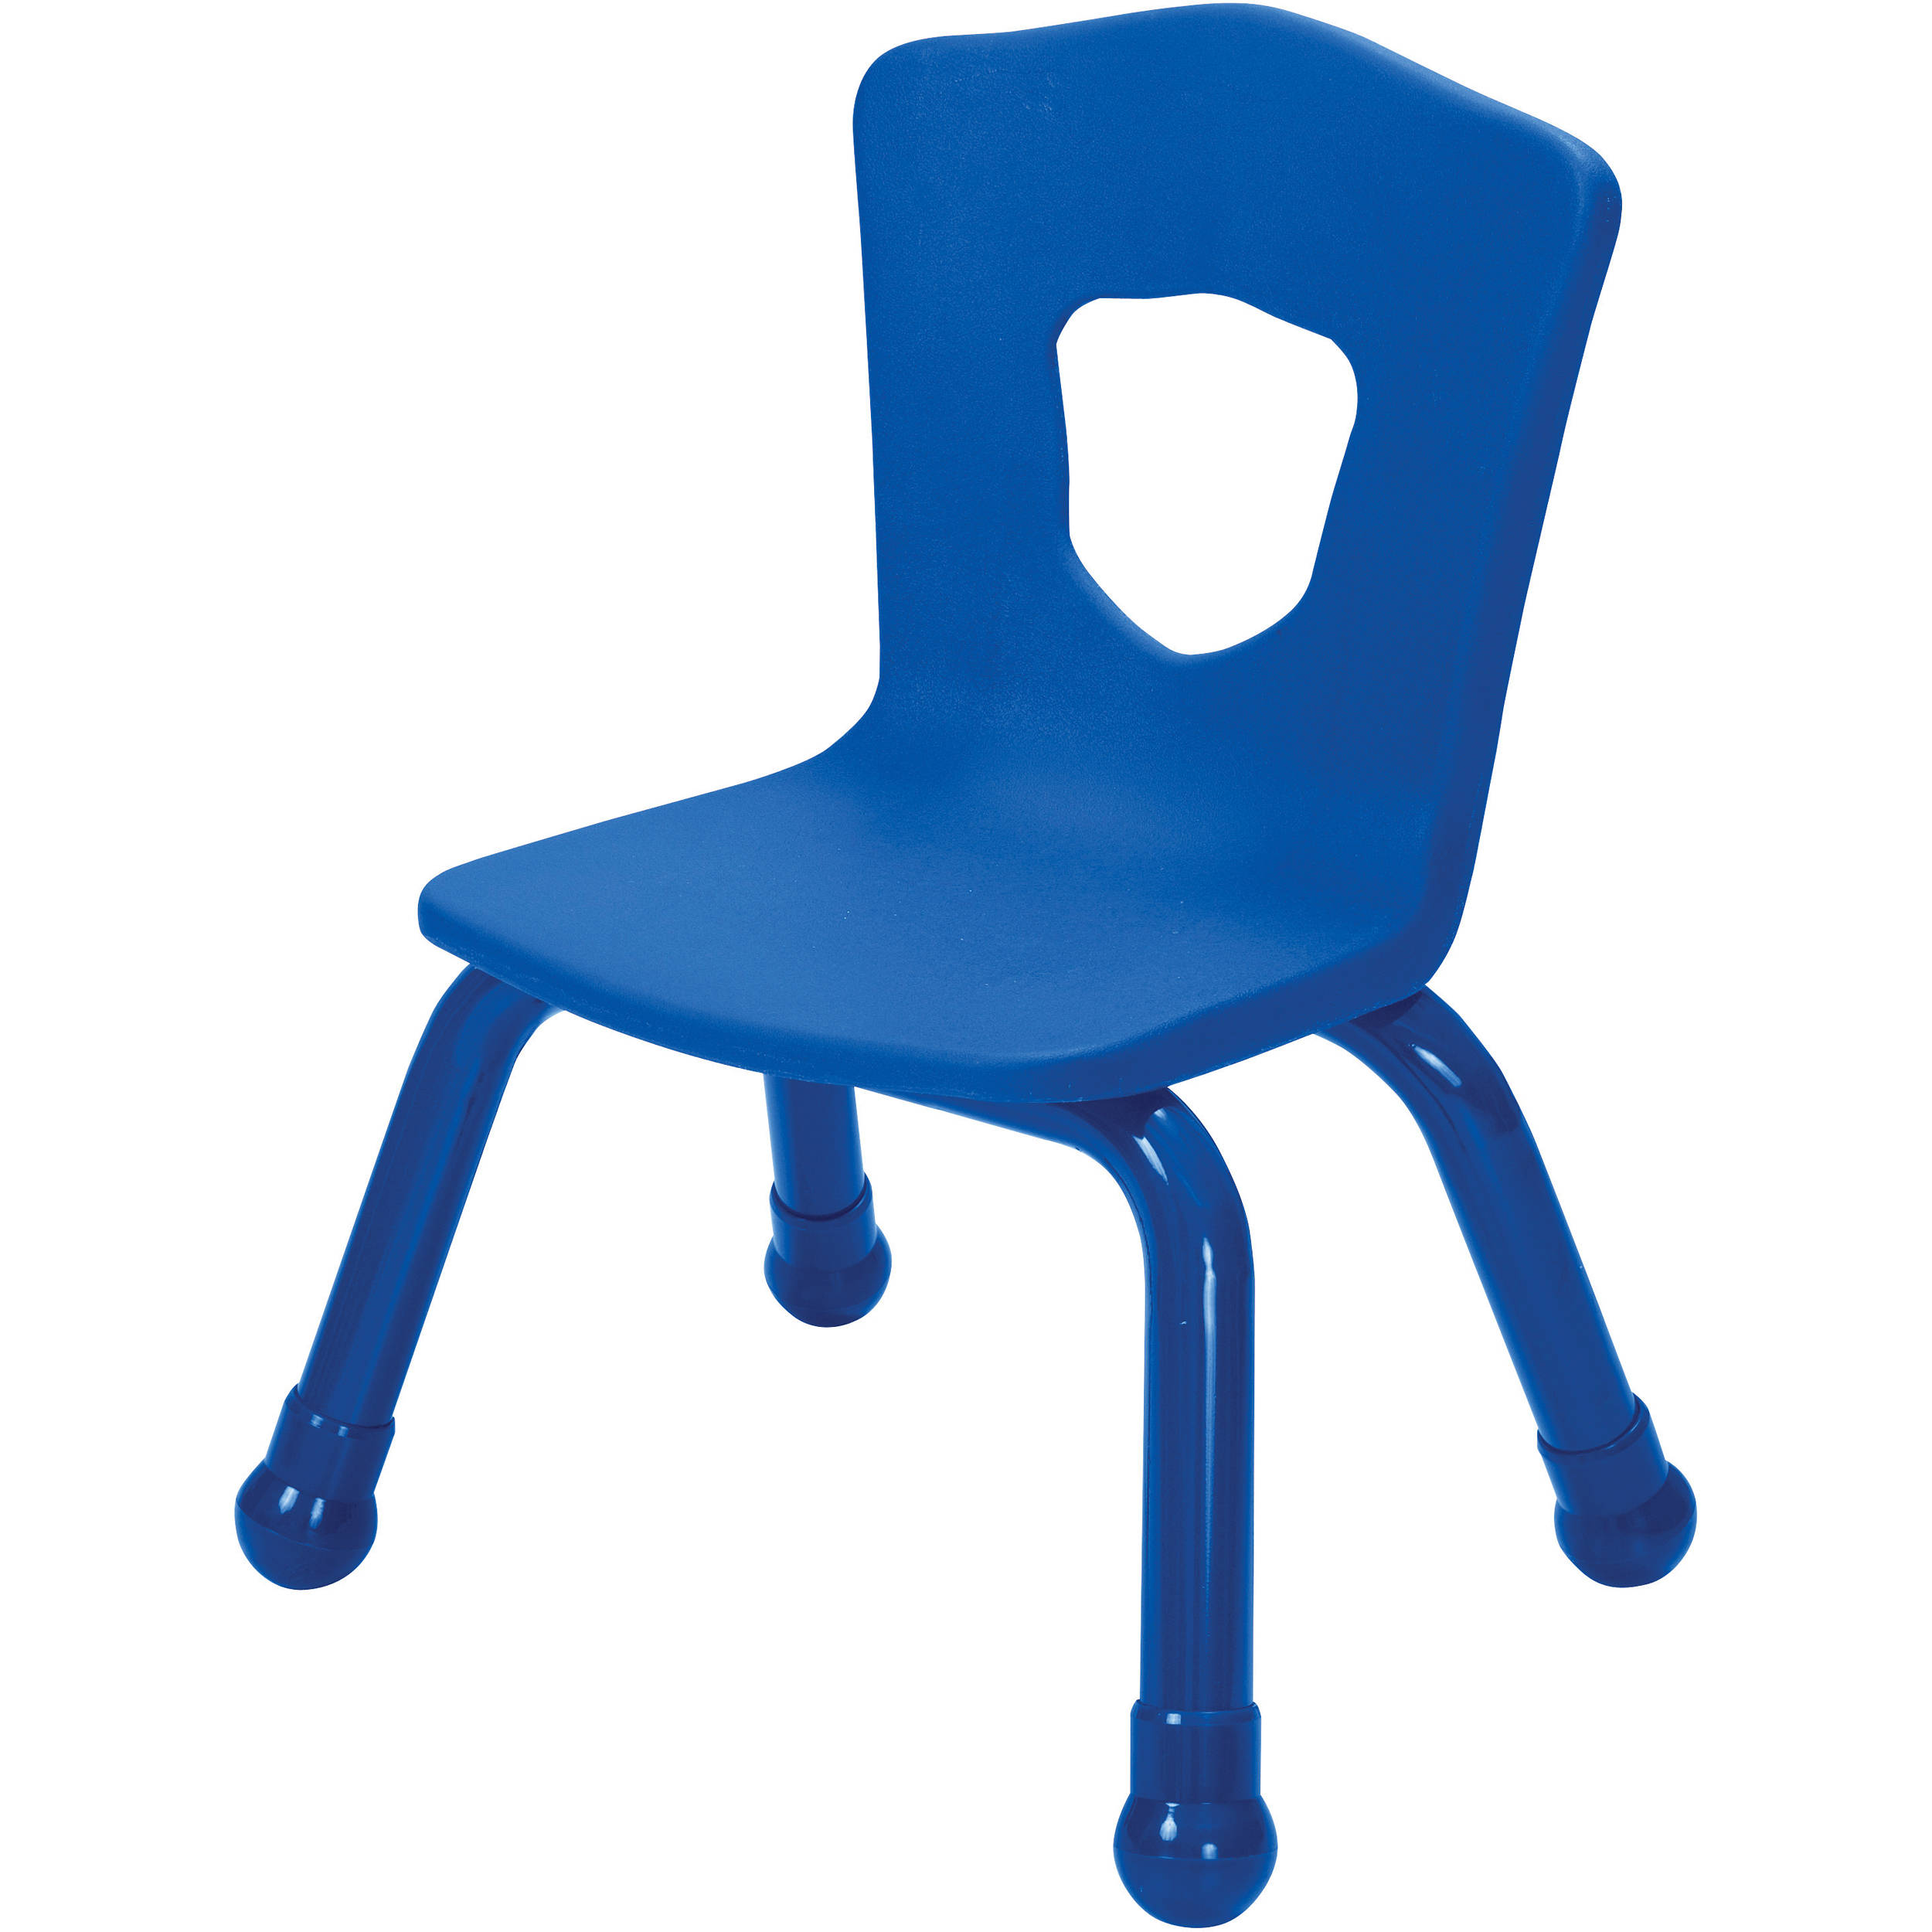 Best Rite 34518 Brite Kids Chair (Royal Blue - Set of 4) 34518